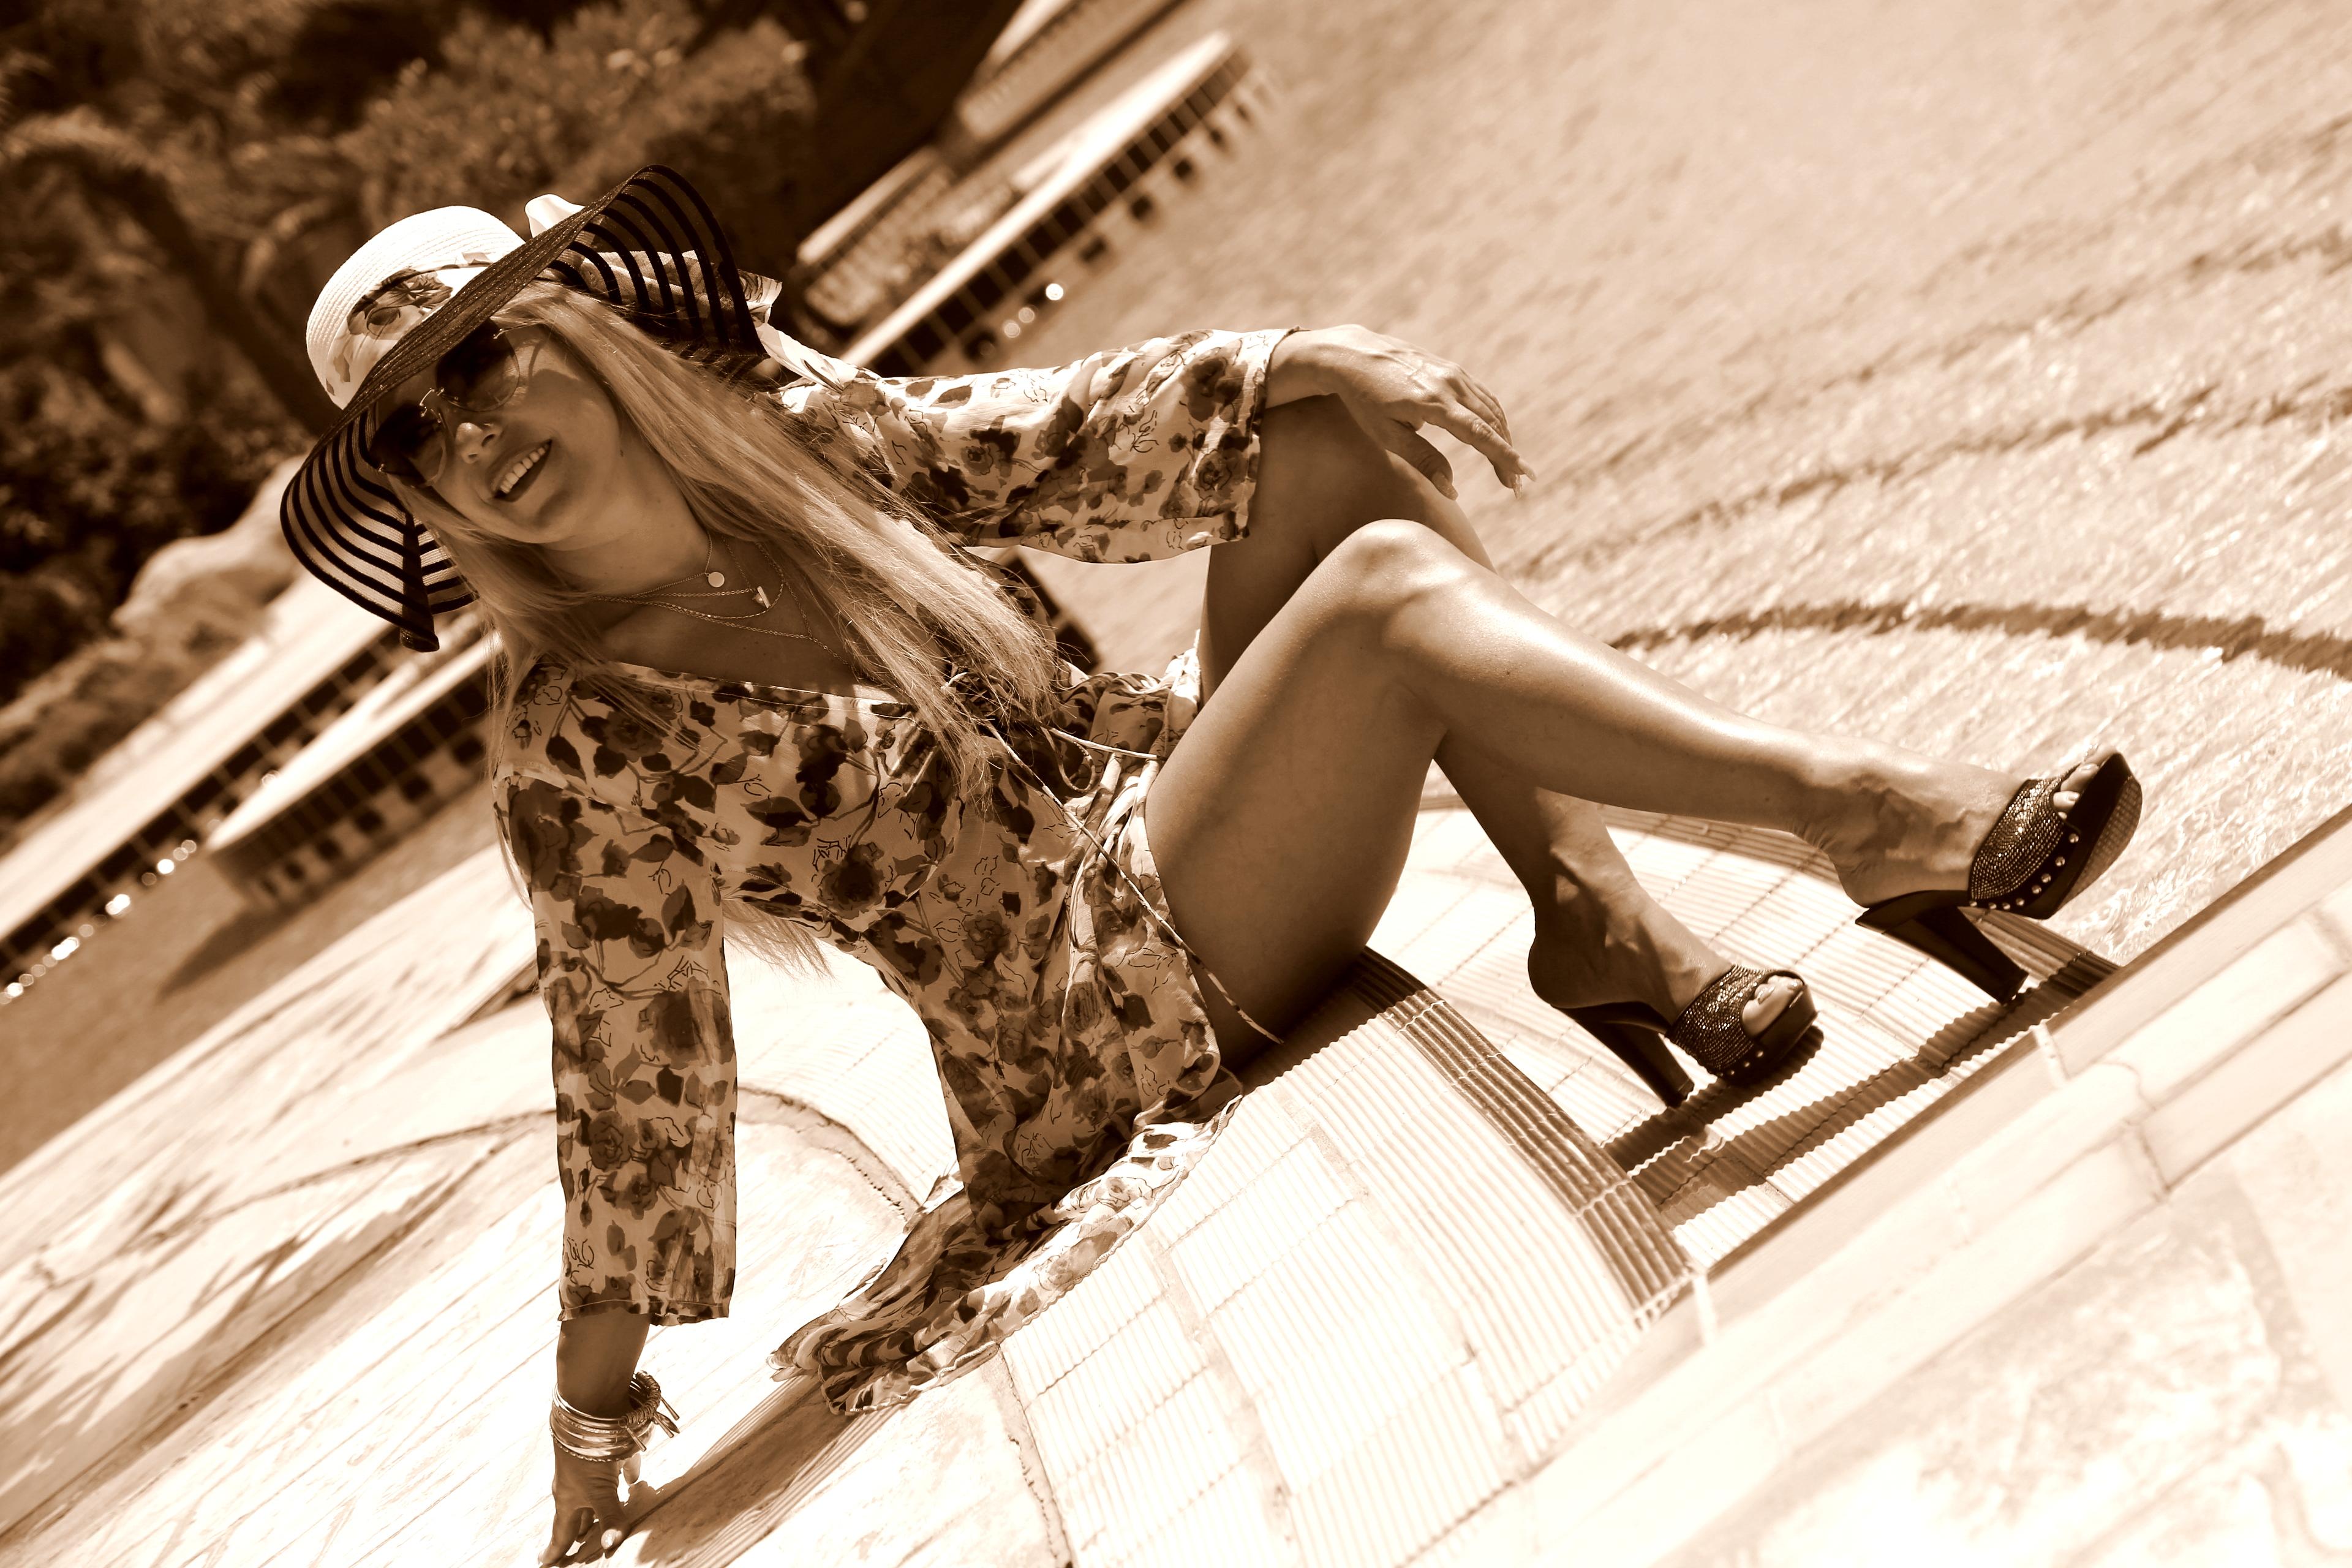 Categories: Glamour, Portrait; Model IRYNA BORYSYUK; Location: Caserta (CE)